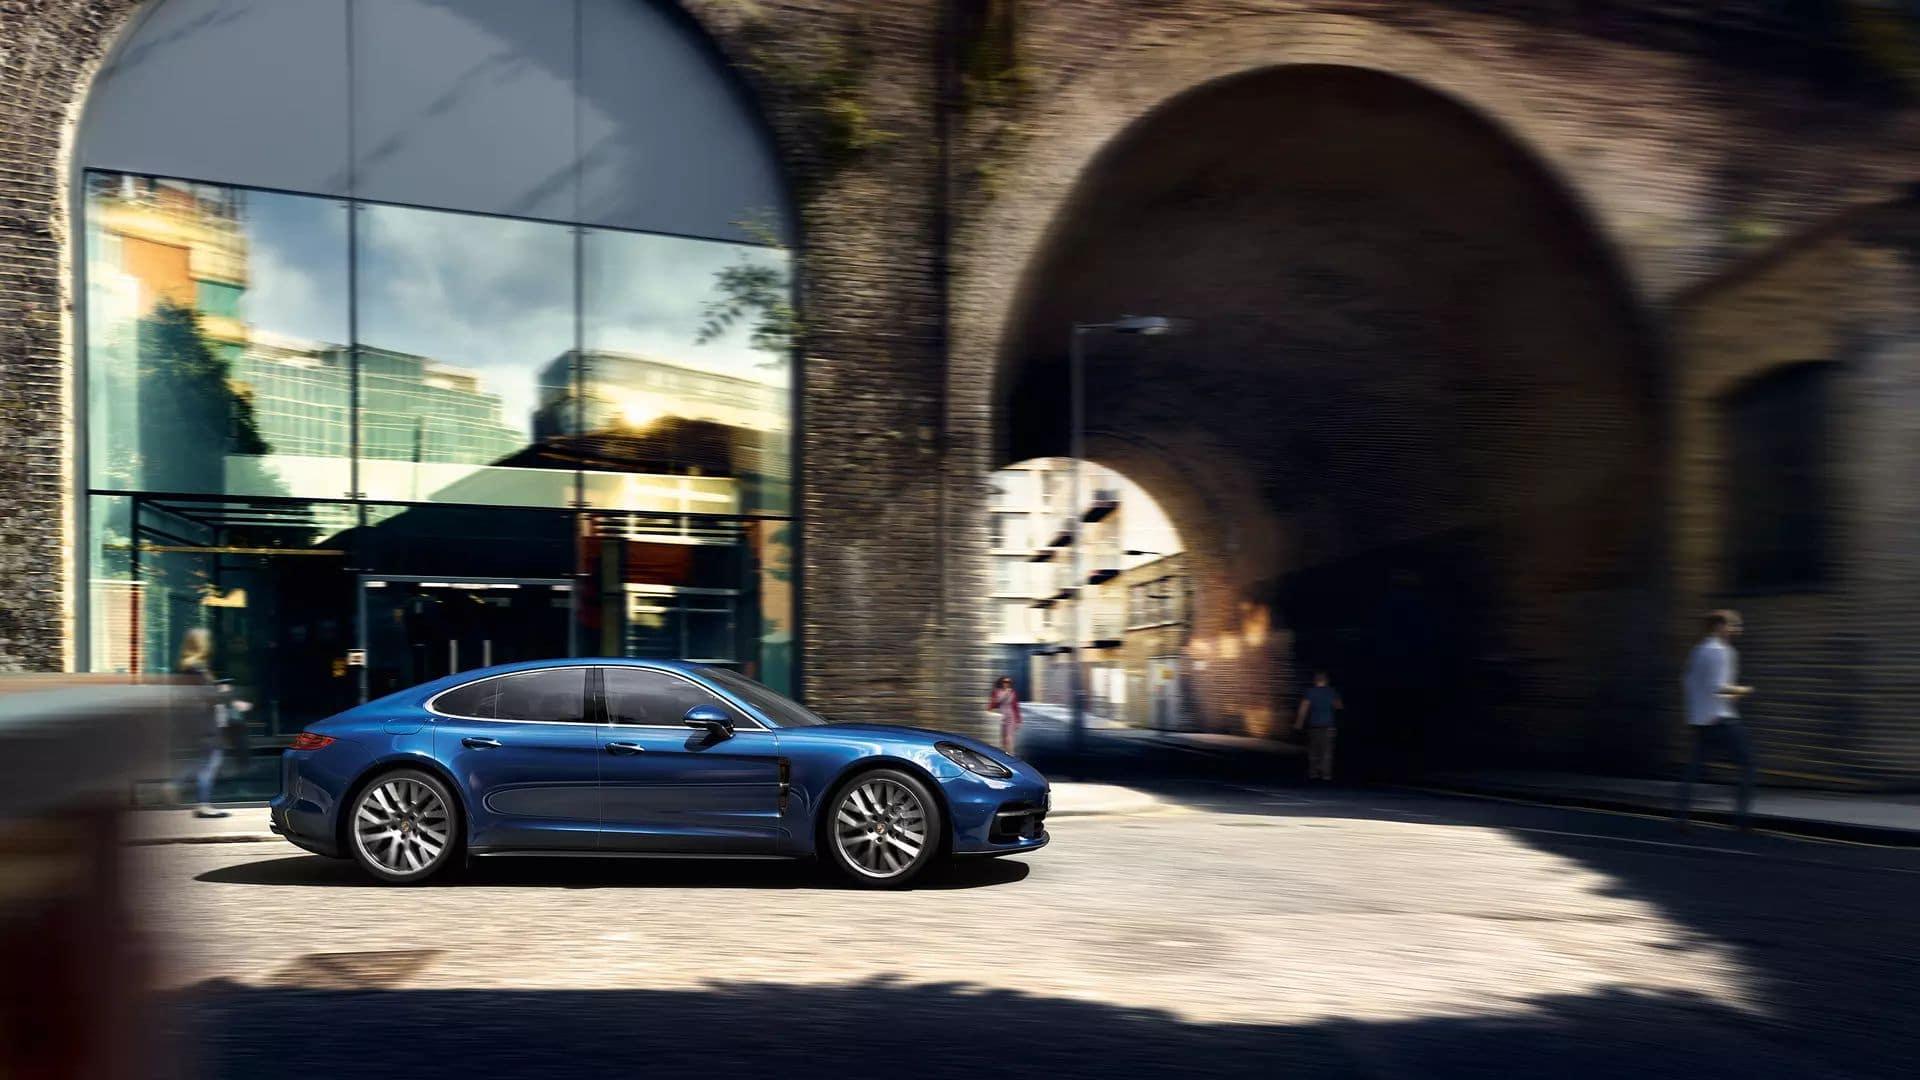 2020 Porsche Panamera Technology